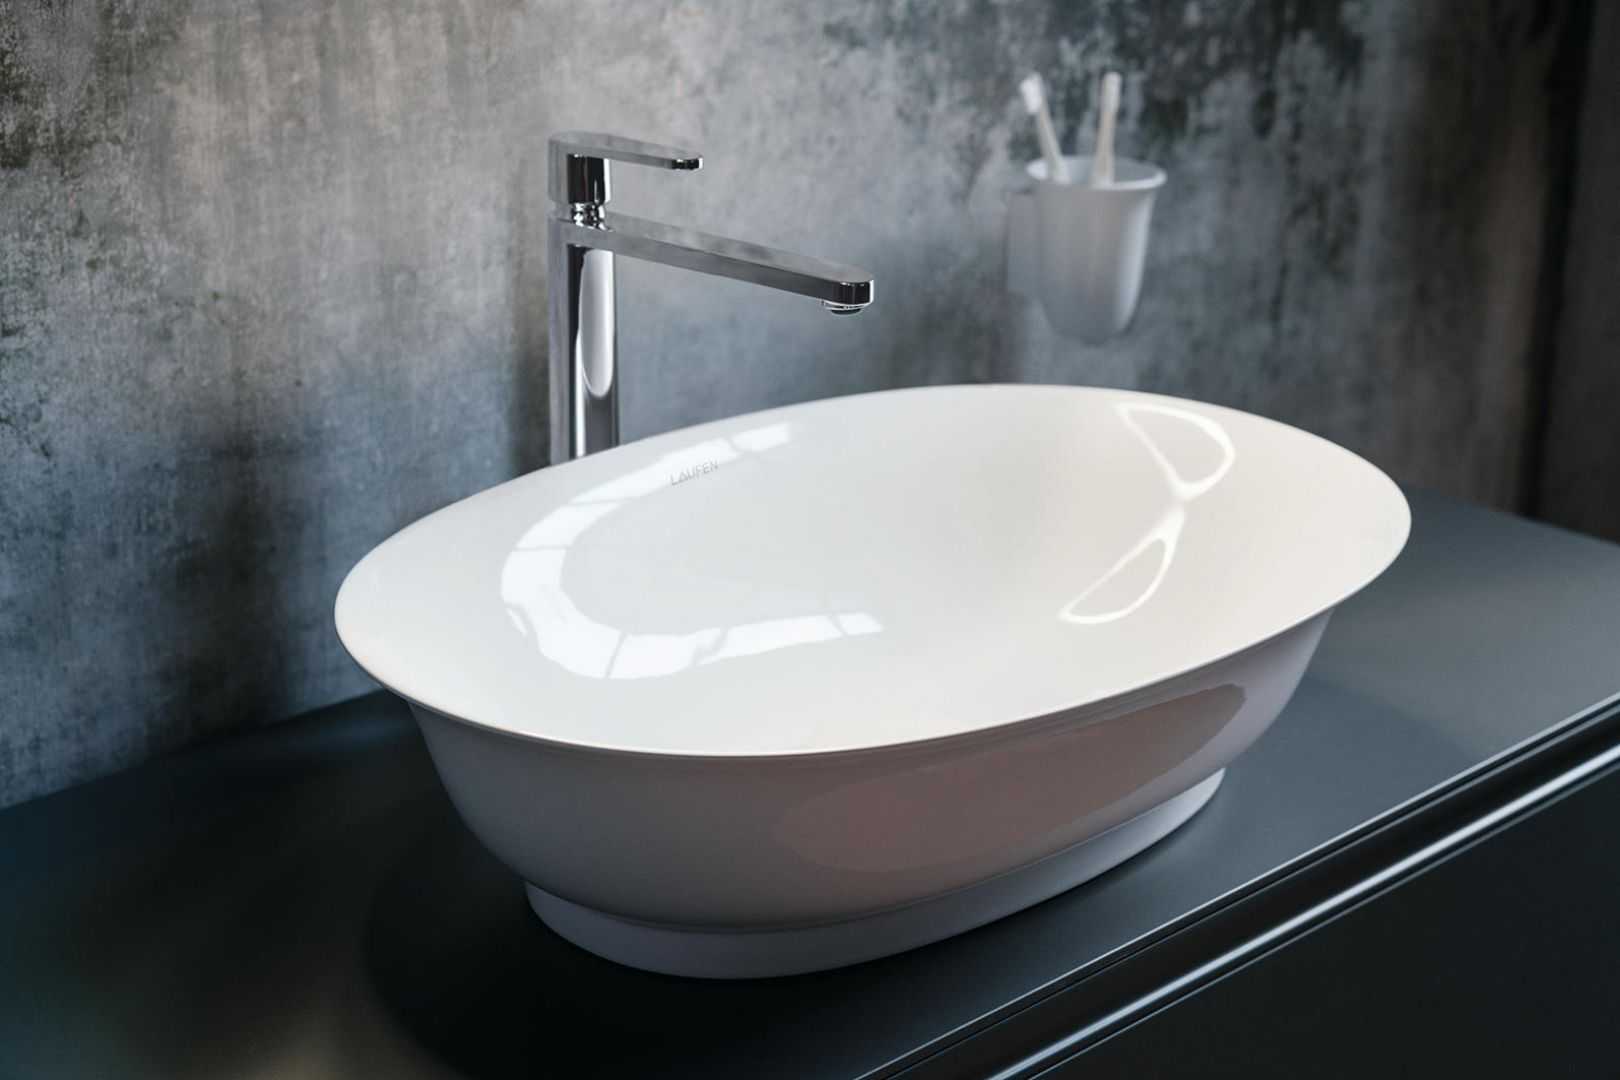 Umywalka z serii New Classic marki Laufen. Fot. Laufen